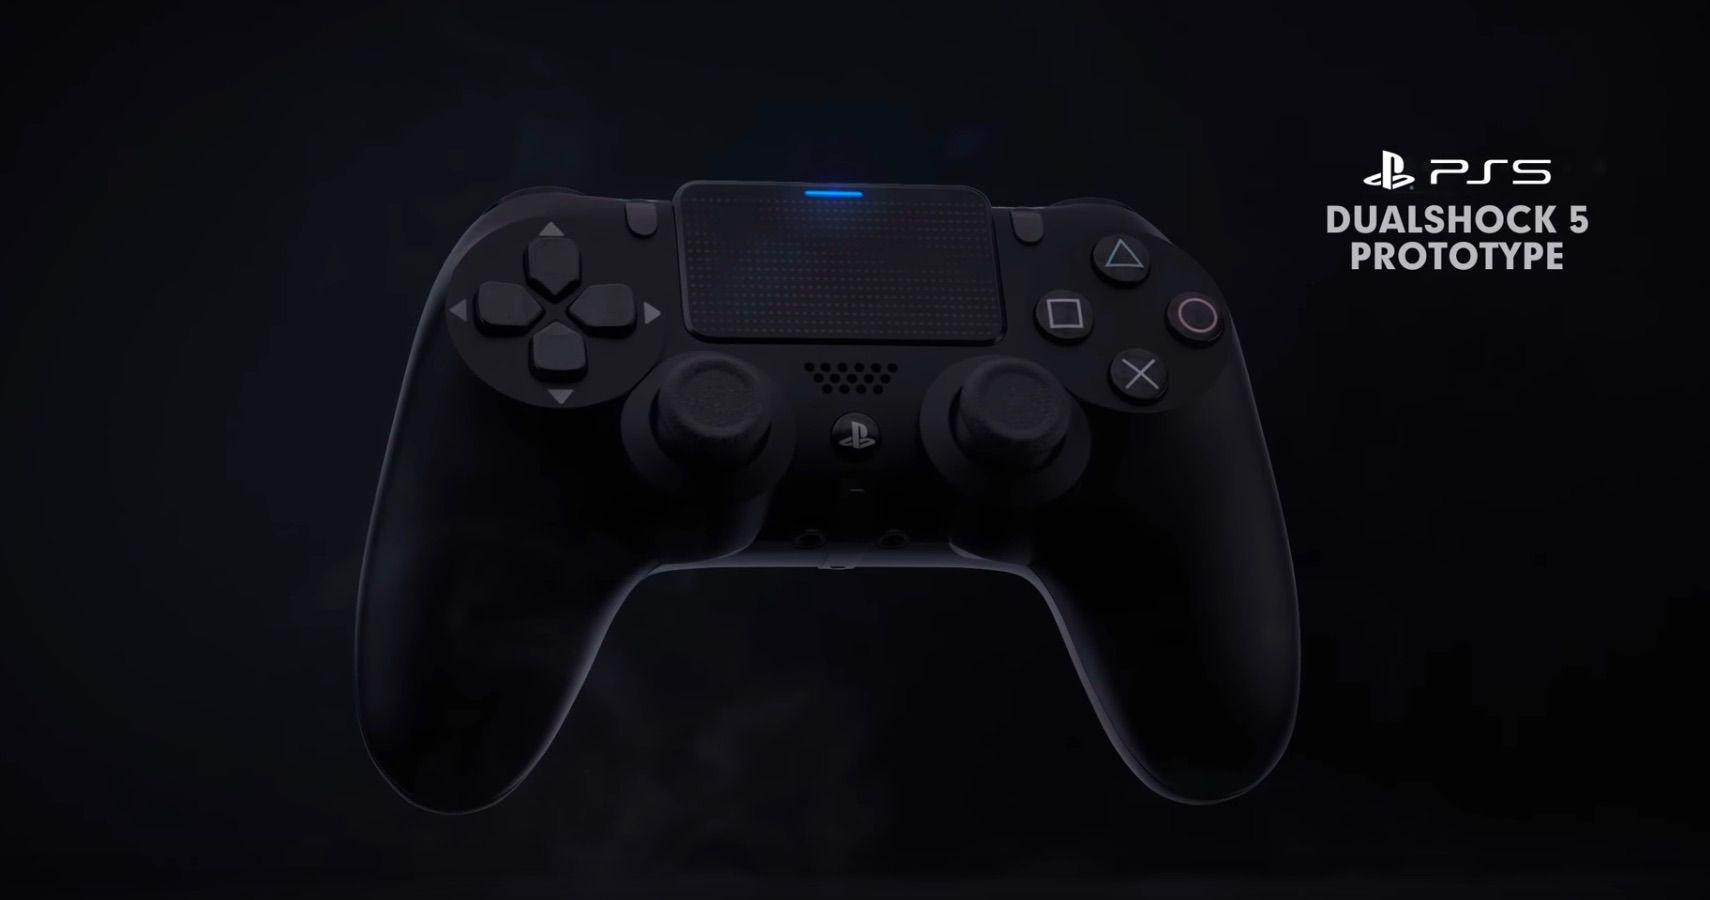 ps5 controller - photo #8